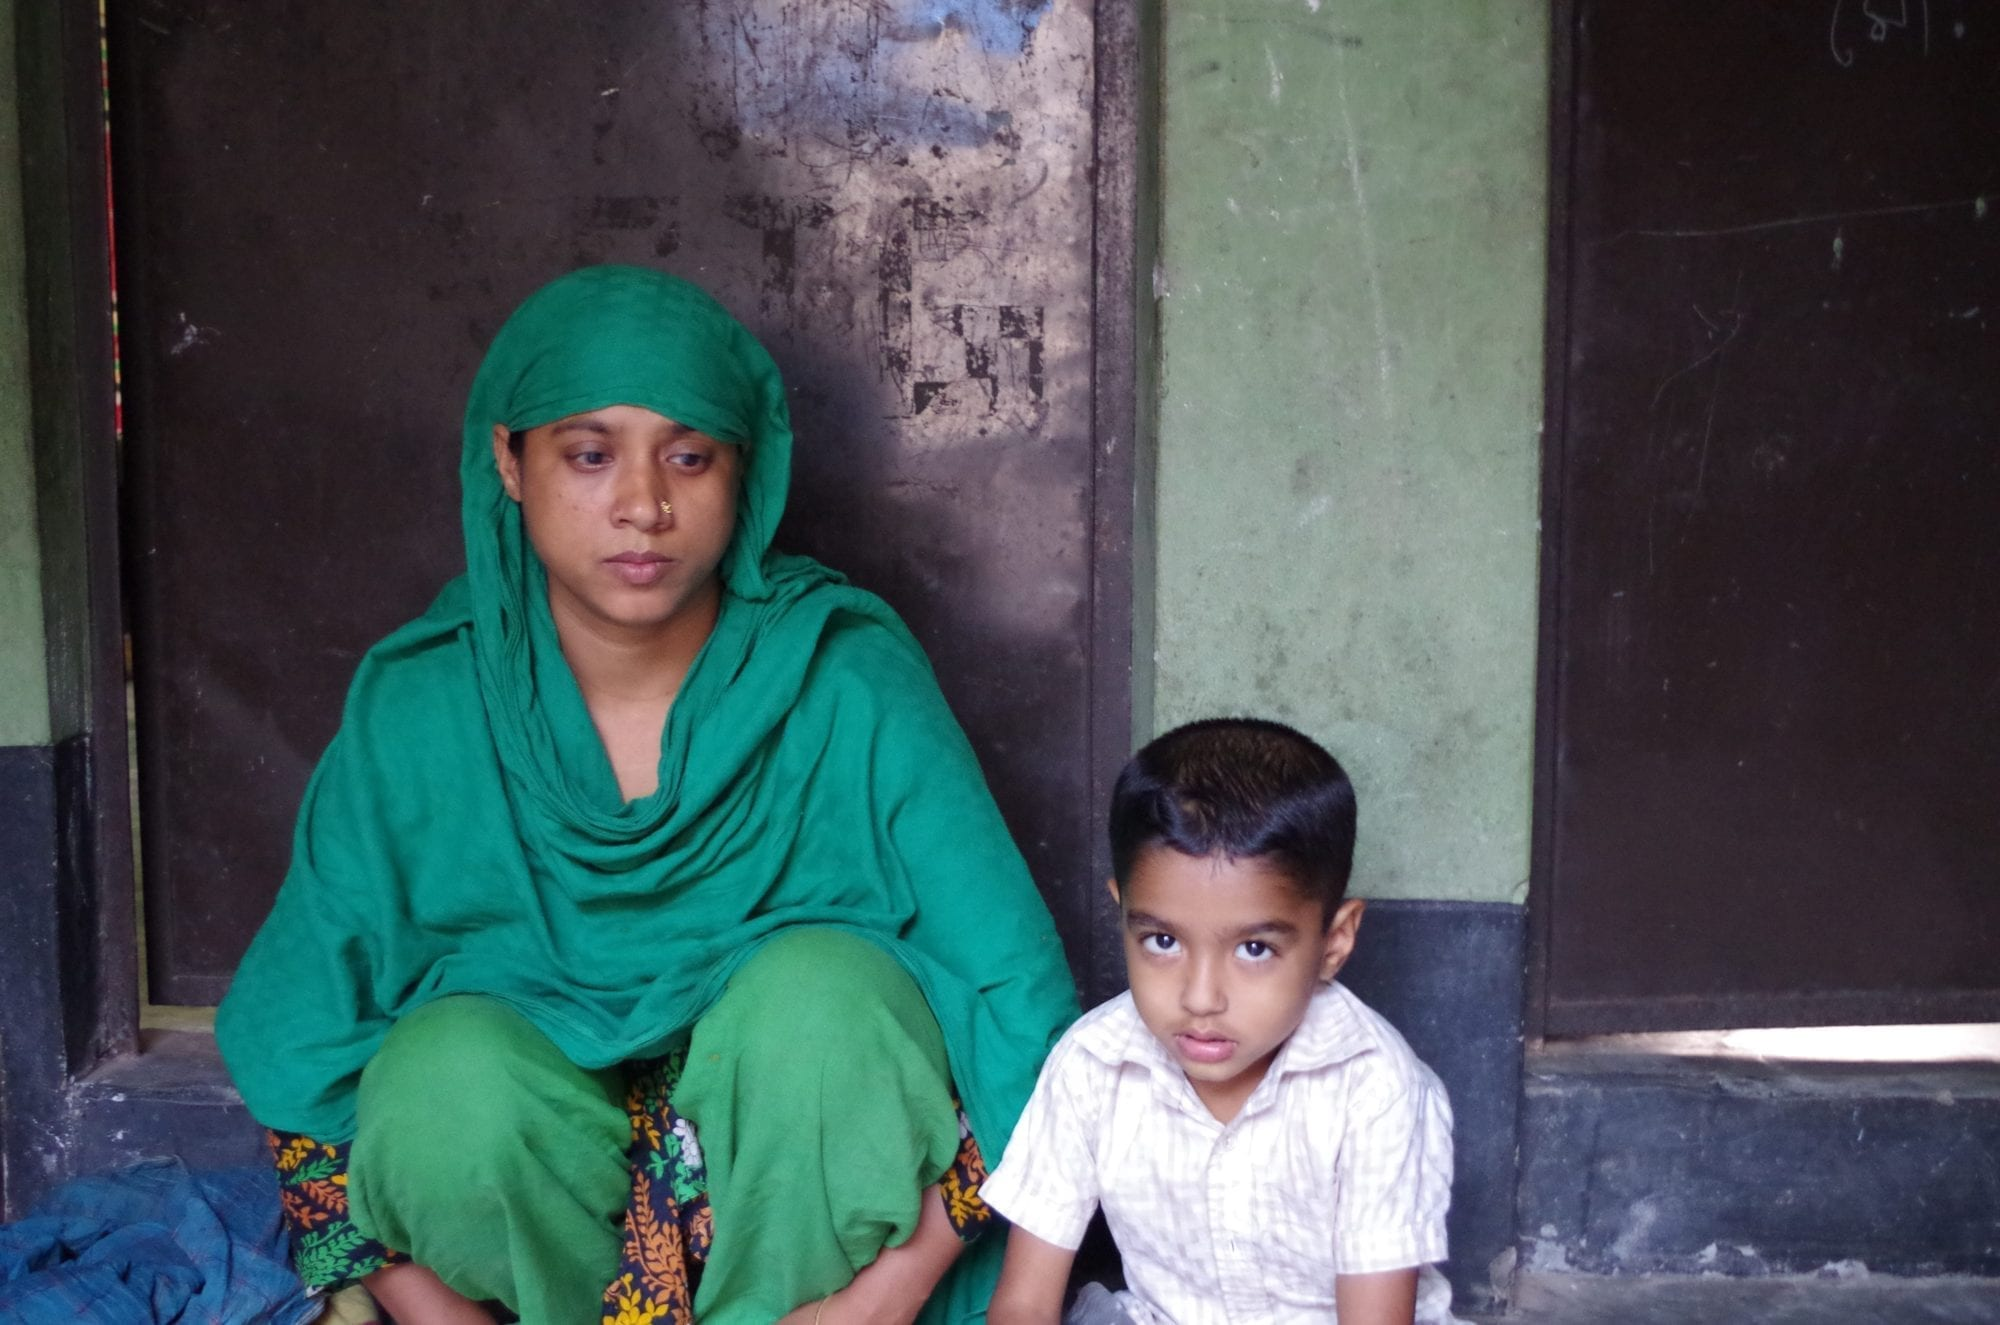 Bangladesh, Tazreen, fire safety, garment worker, Solidarity Center